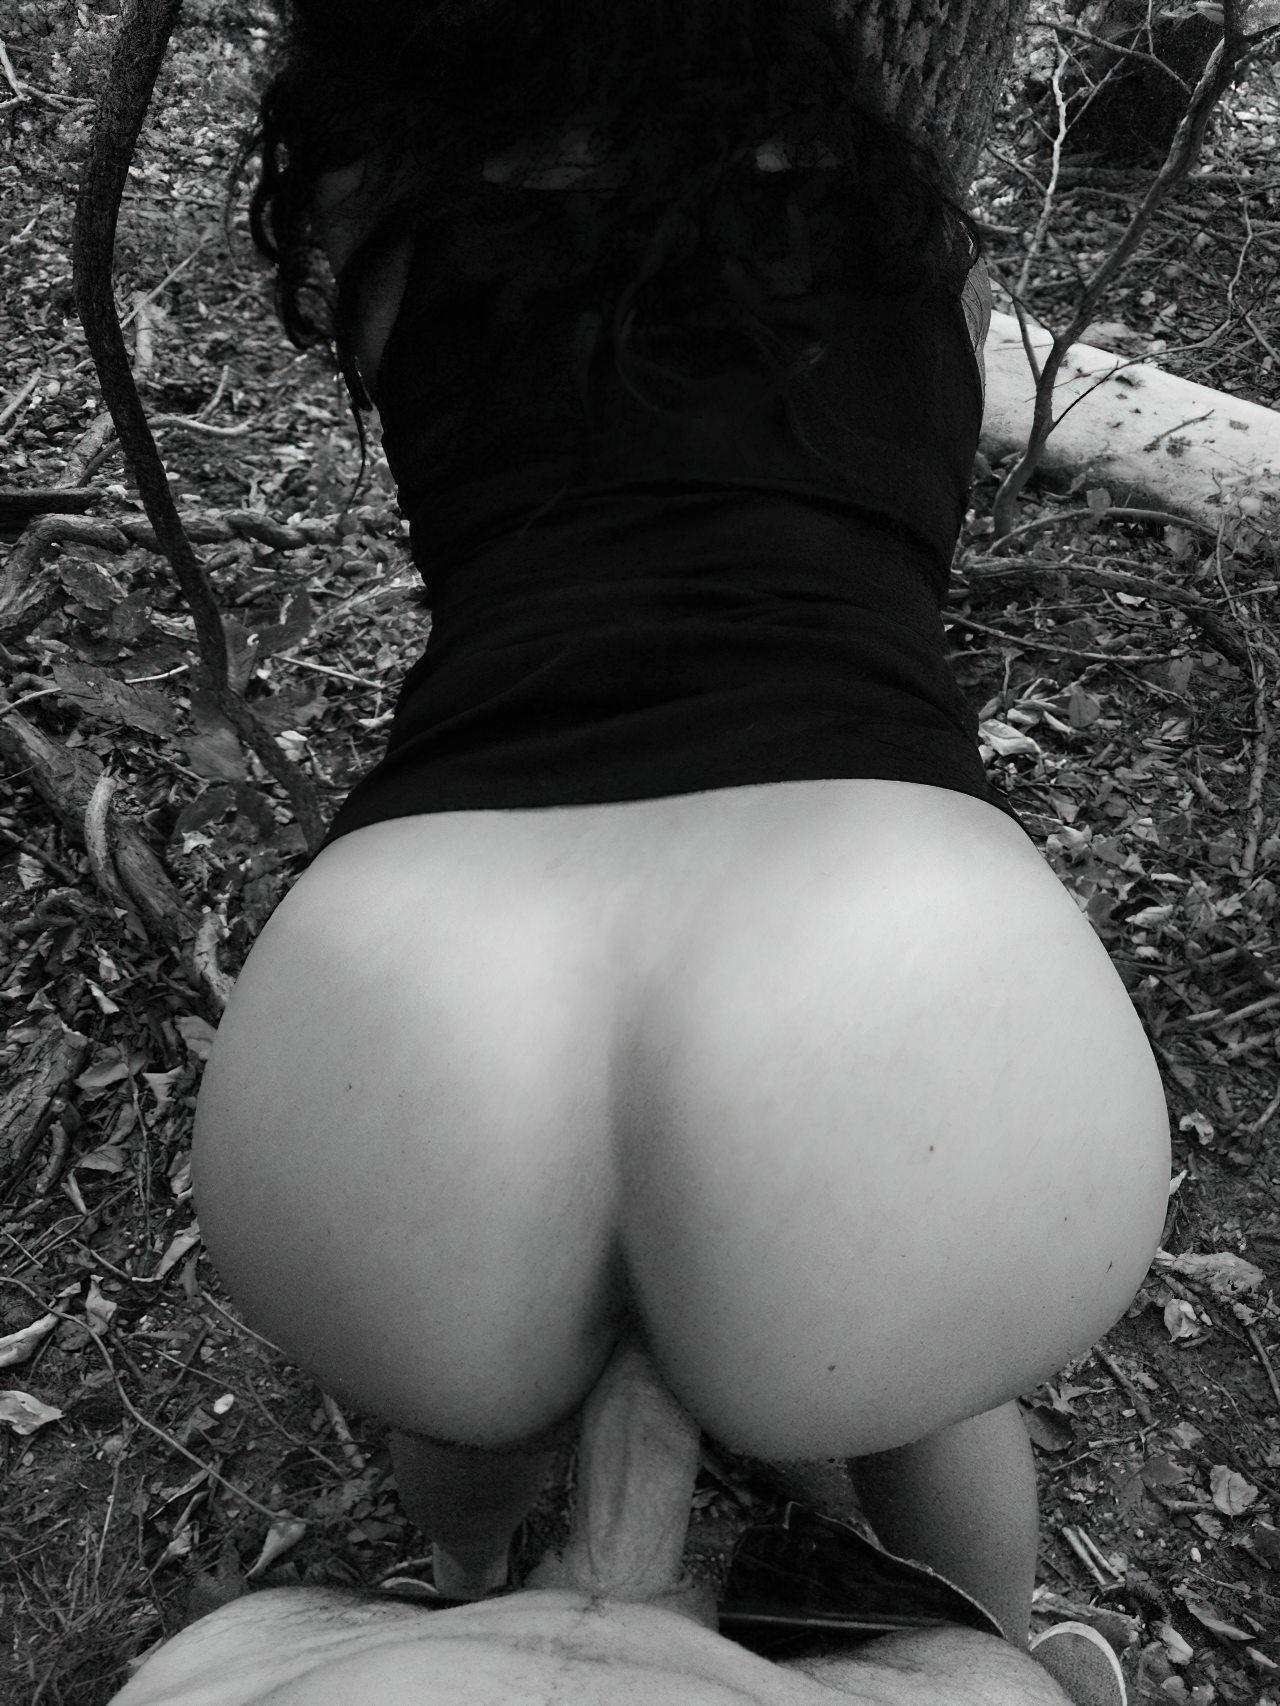 Mulheres Despidas Fotos (12)